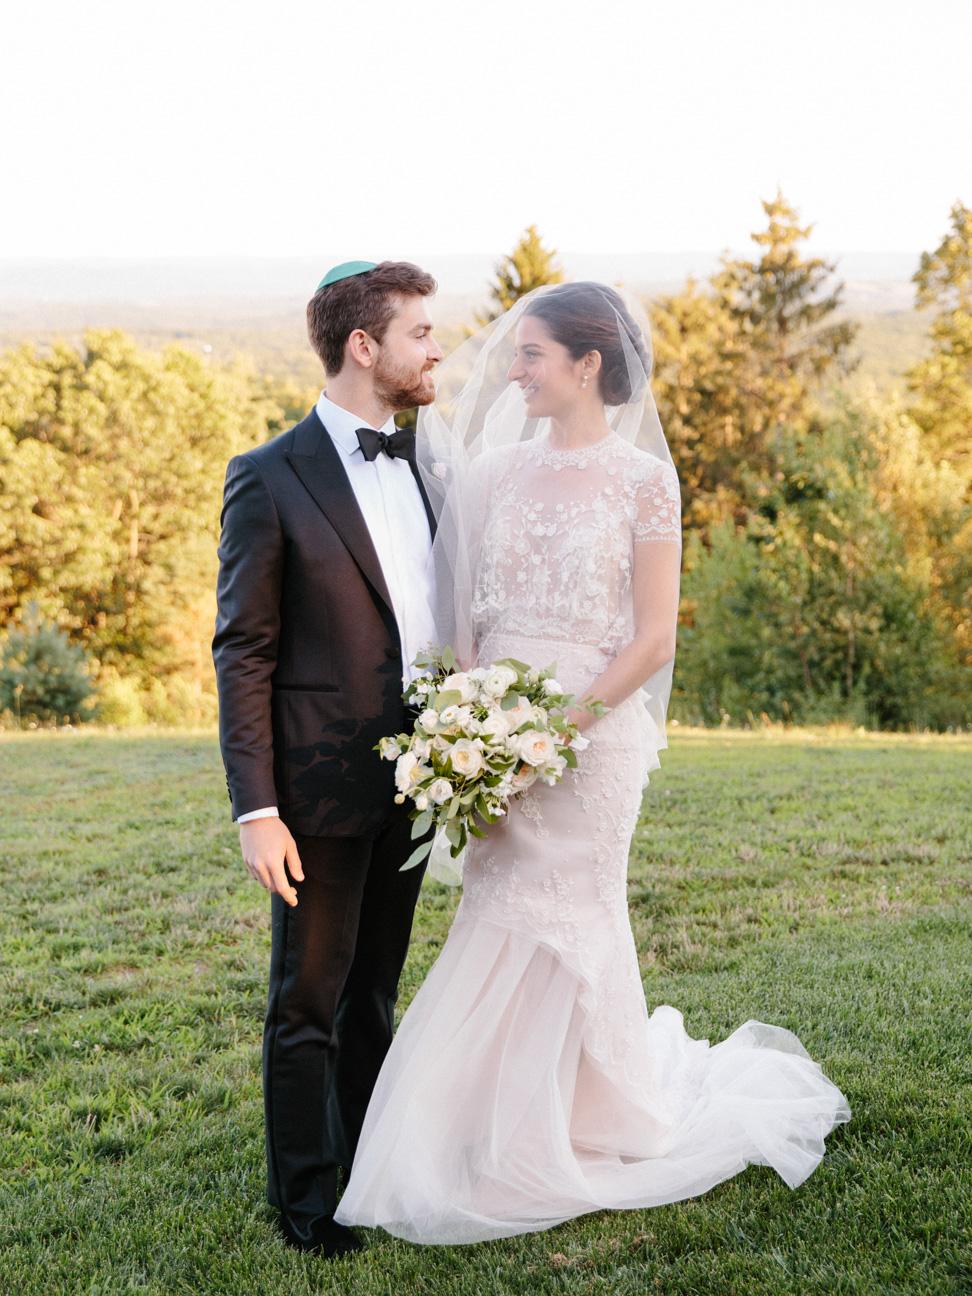 KarenHillPhotography-Parizat-Wedding-0477.jpg